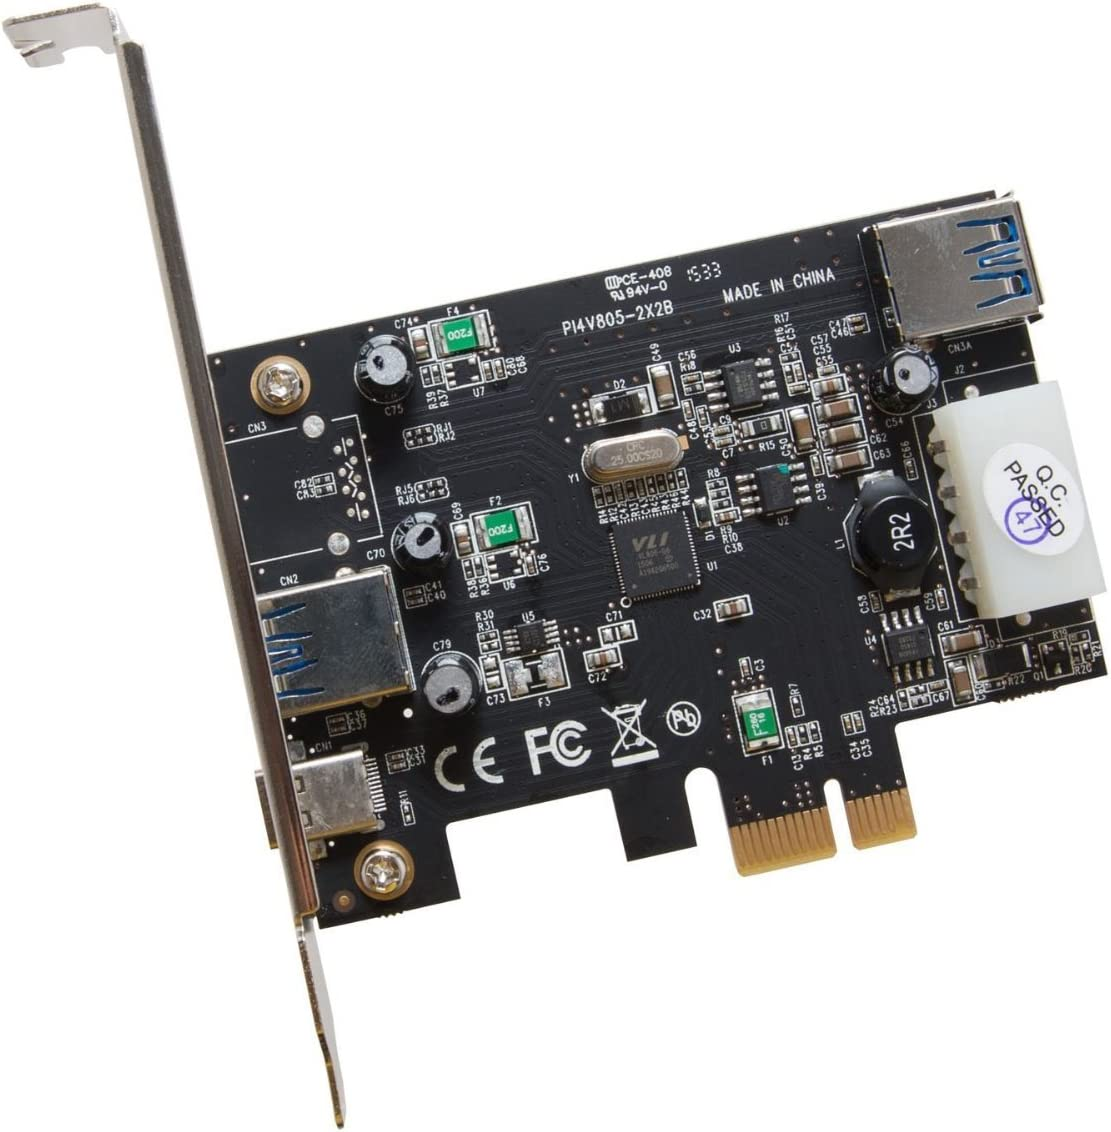 Infozone SY-PEX20203 USB 3.1 Type-C PCI-E Card Black